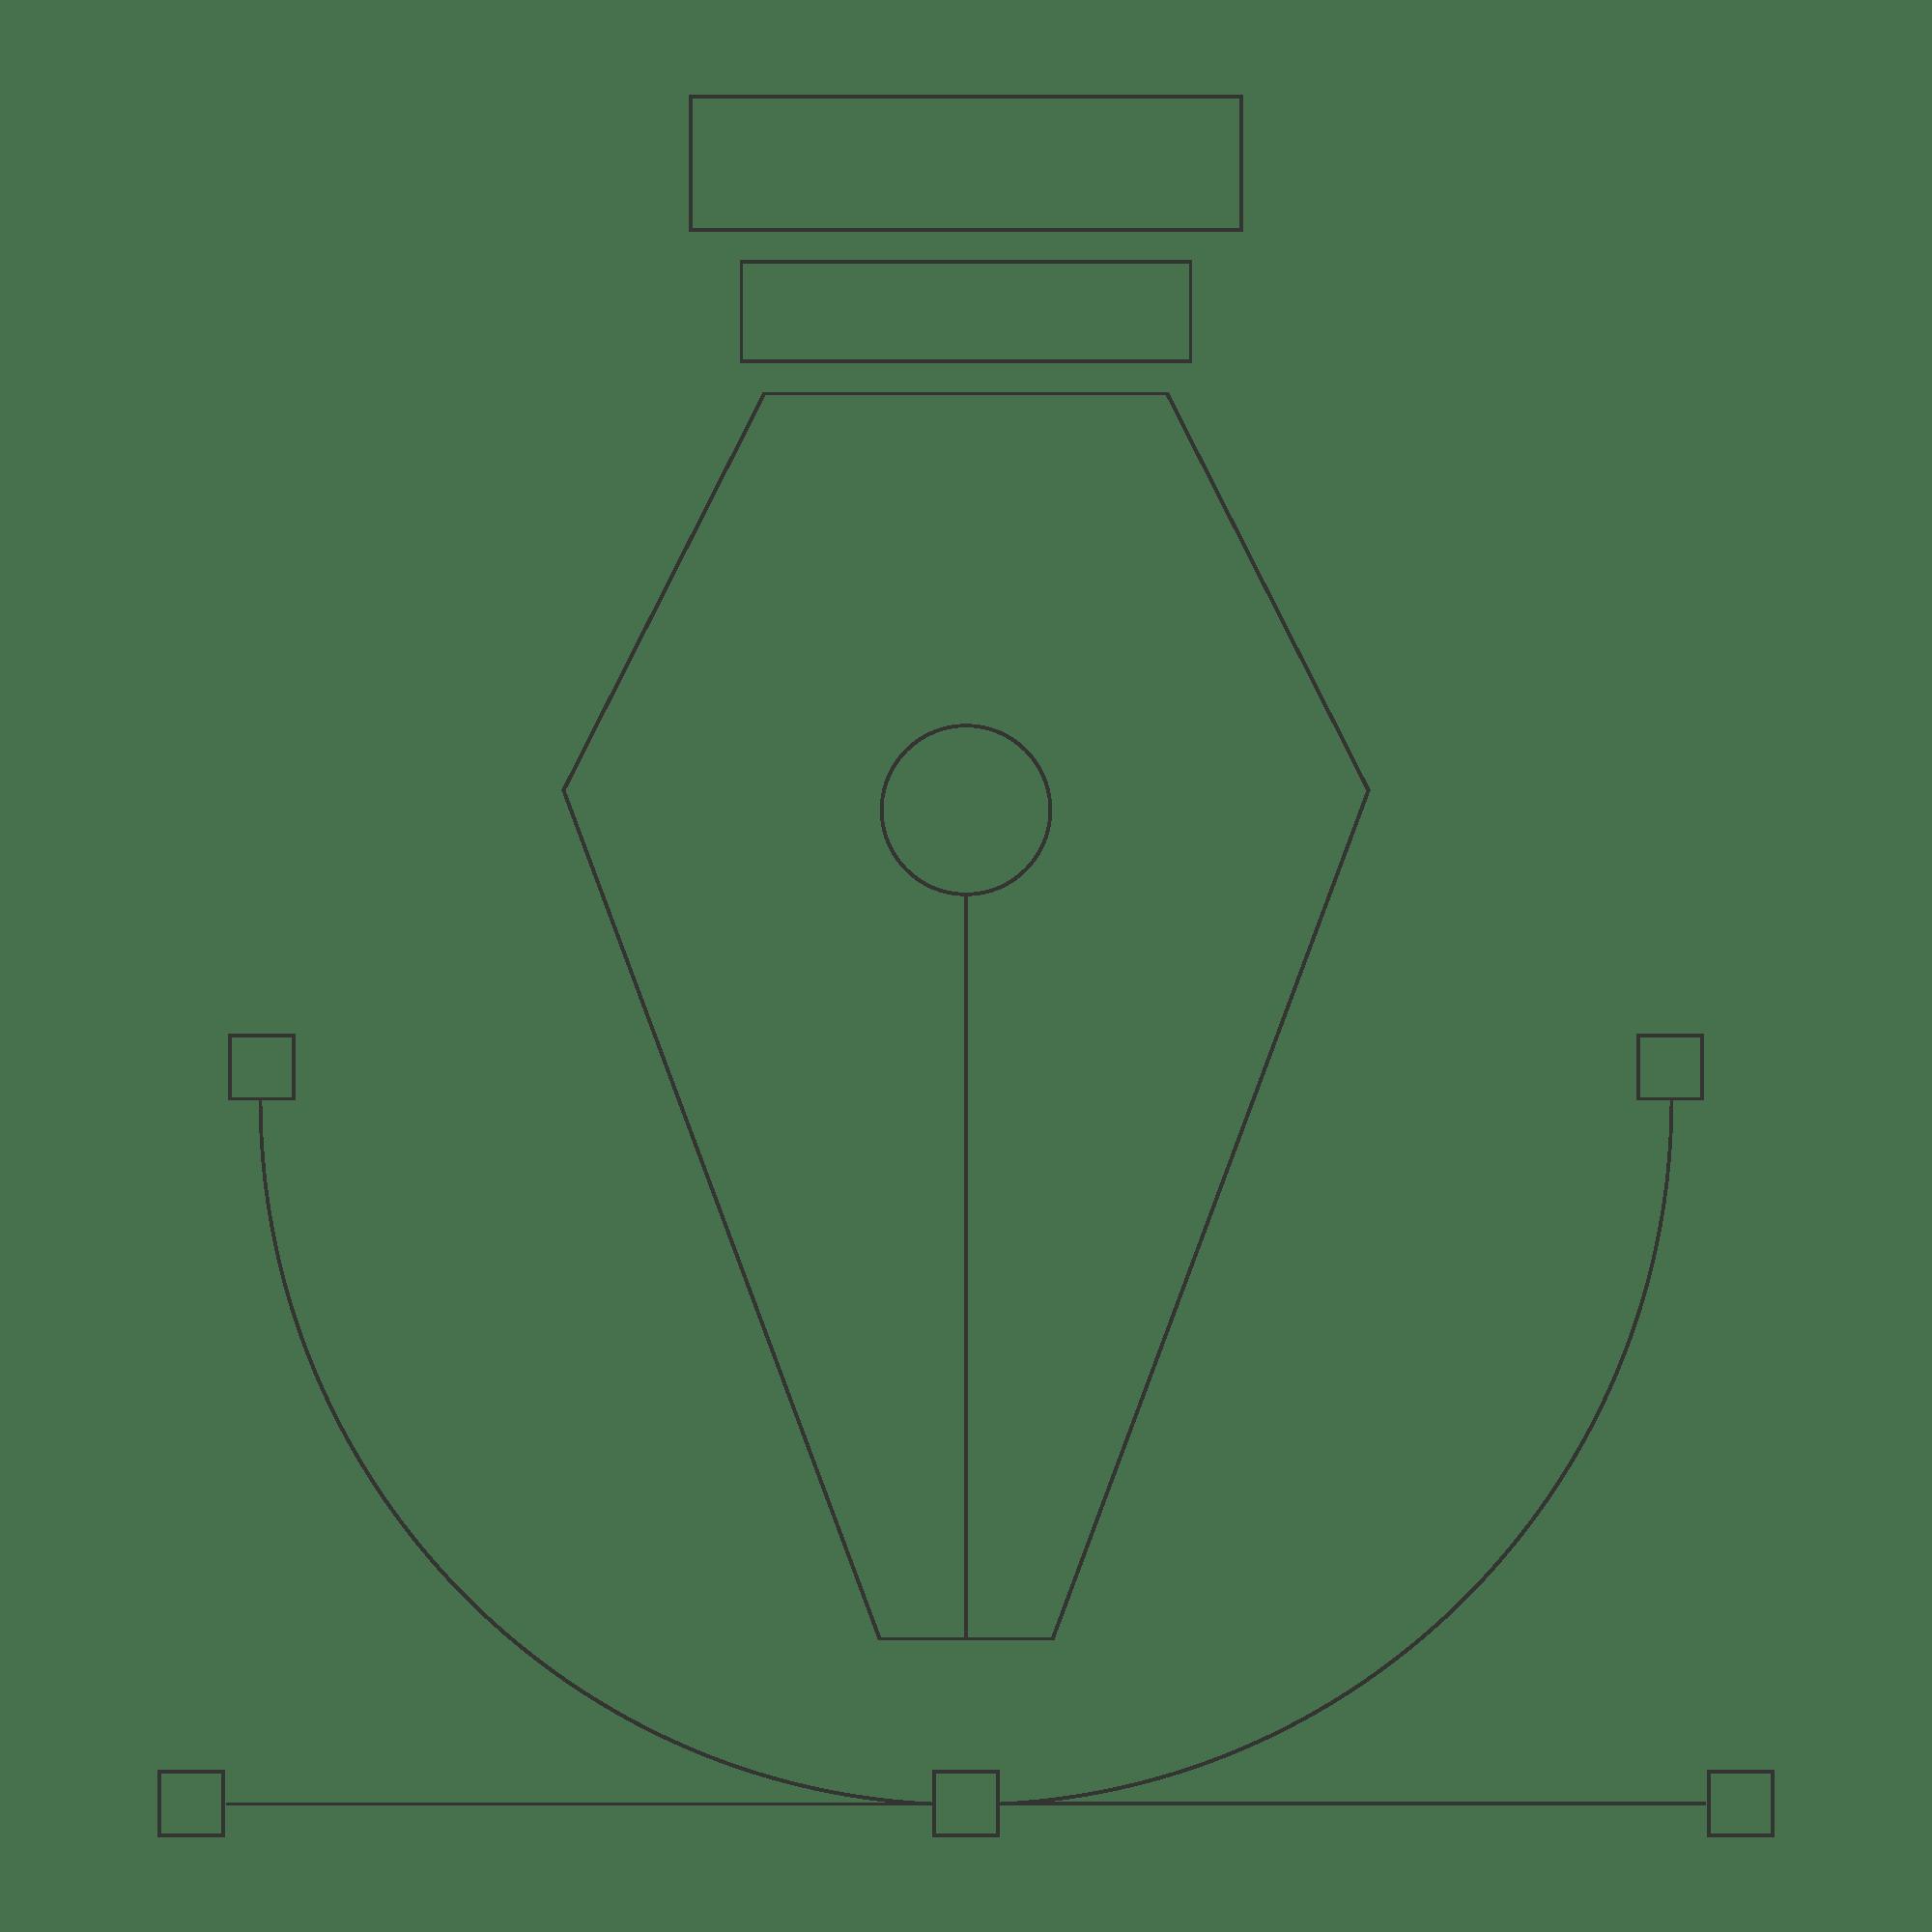 graphic-design-icon-free-download-343434